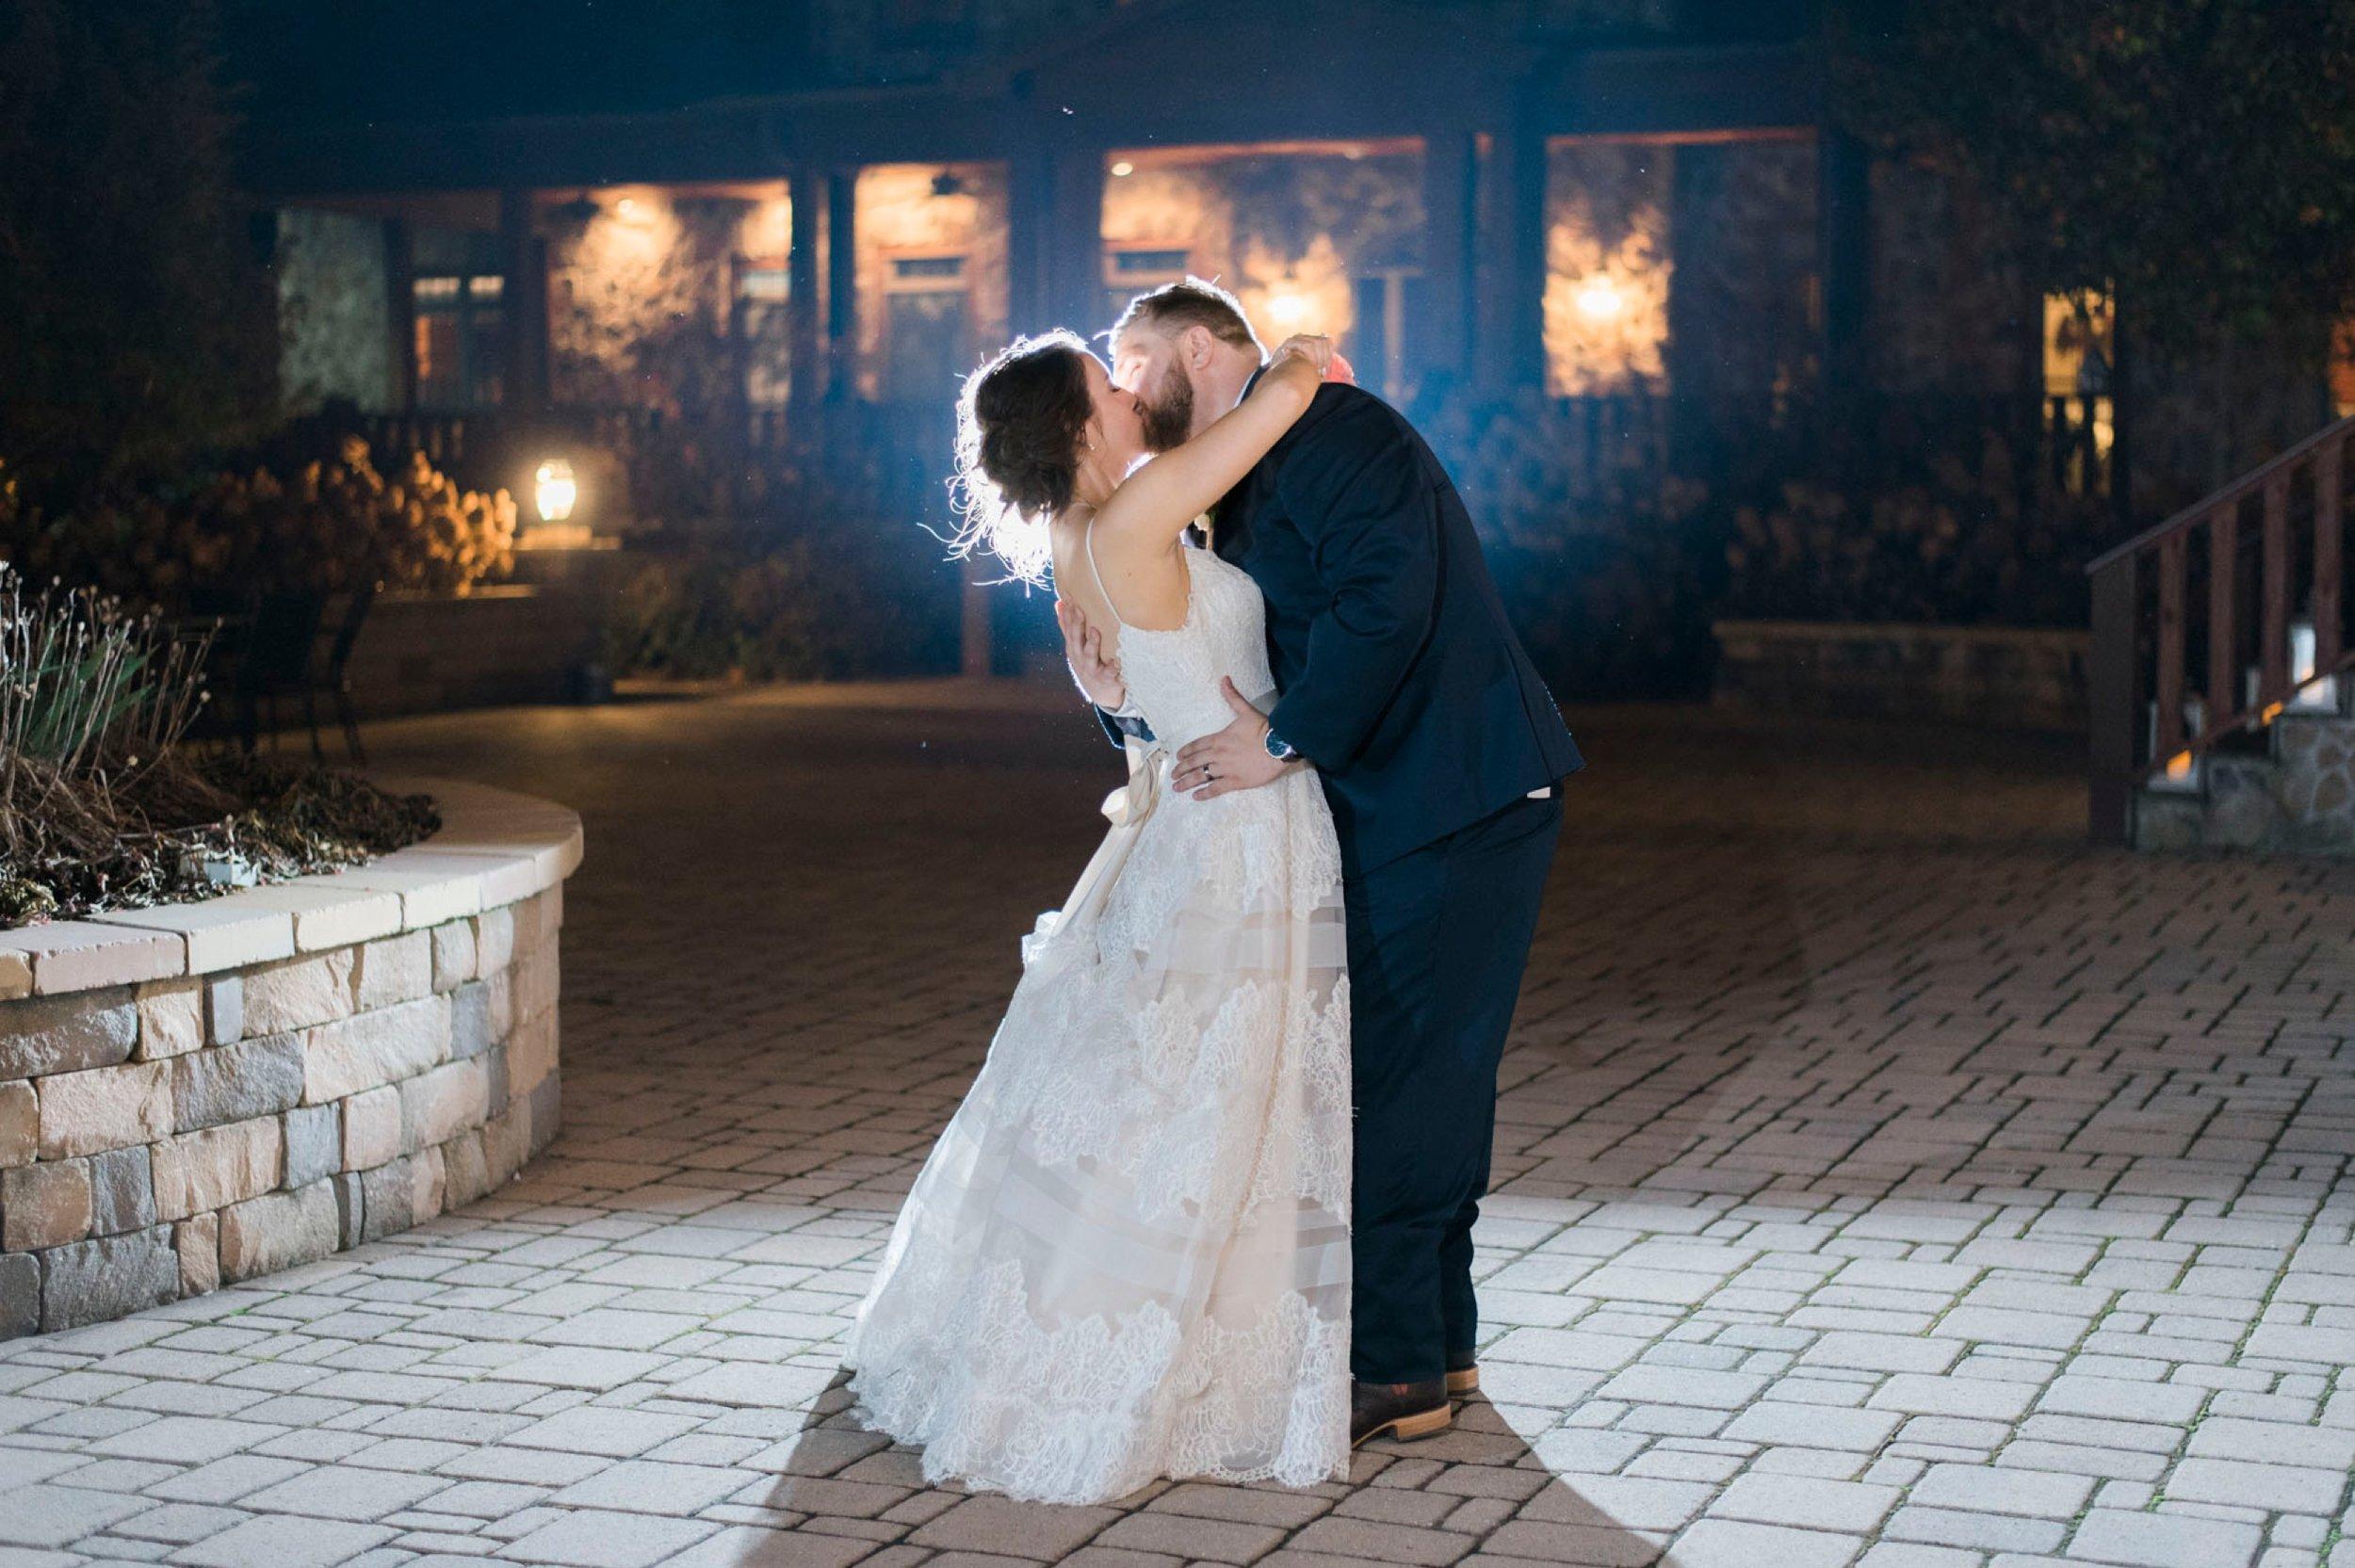 IrvineEstate_LexingtonVA_Wedding_FallWedding_VirginiaWeddingPhotographer 107.jpg